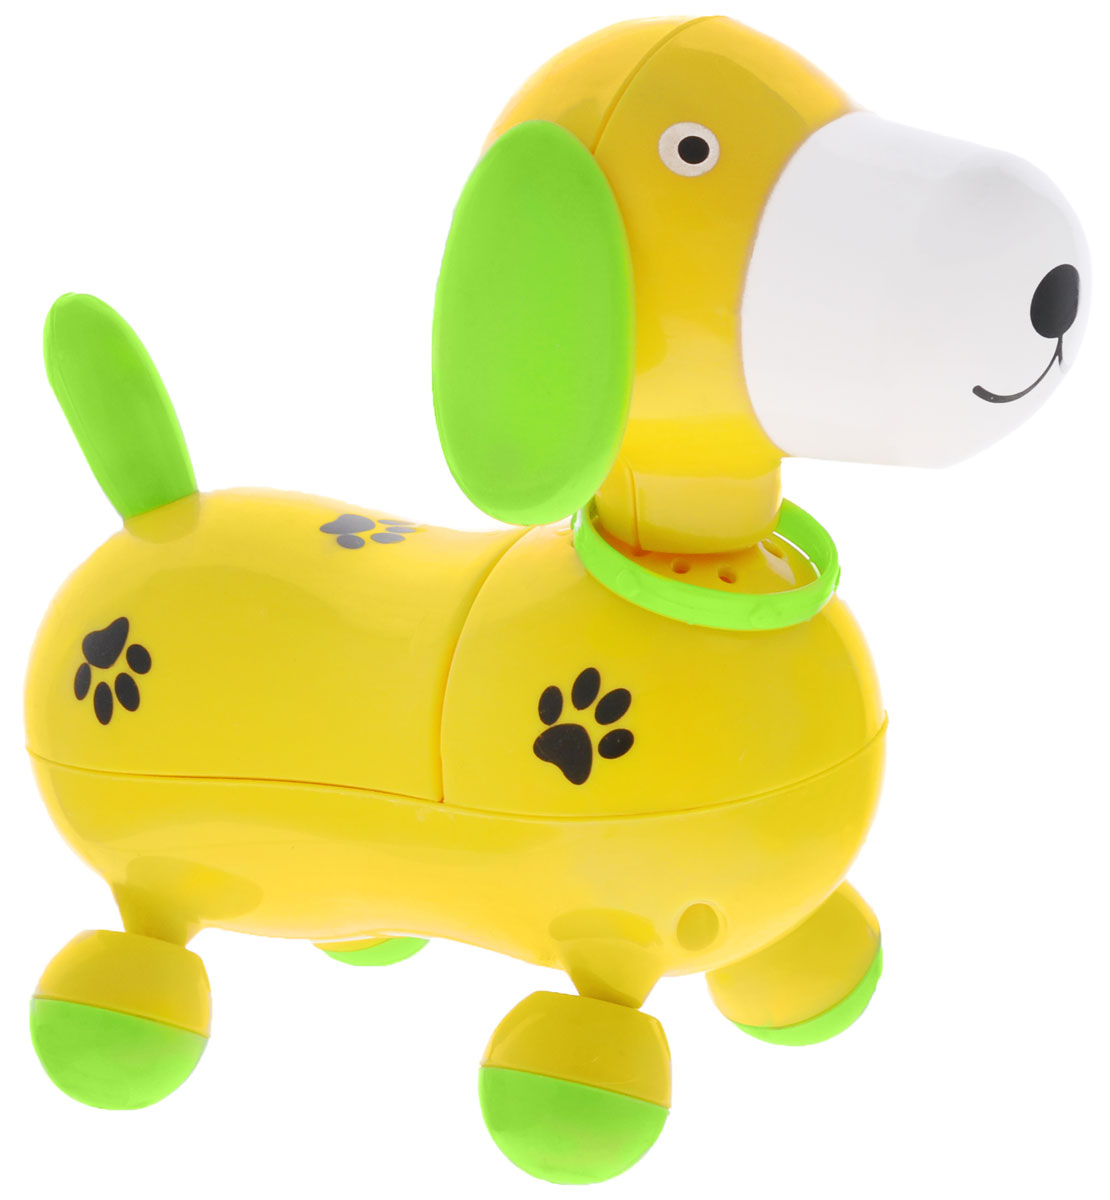 Mommy Love Электронная развивающая игрушка Веселый щенок цвет желтый фигурки игрушки mommy love электронная развивающая игрушка веселая овечка